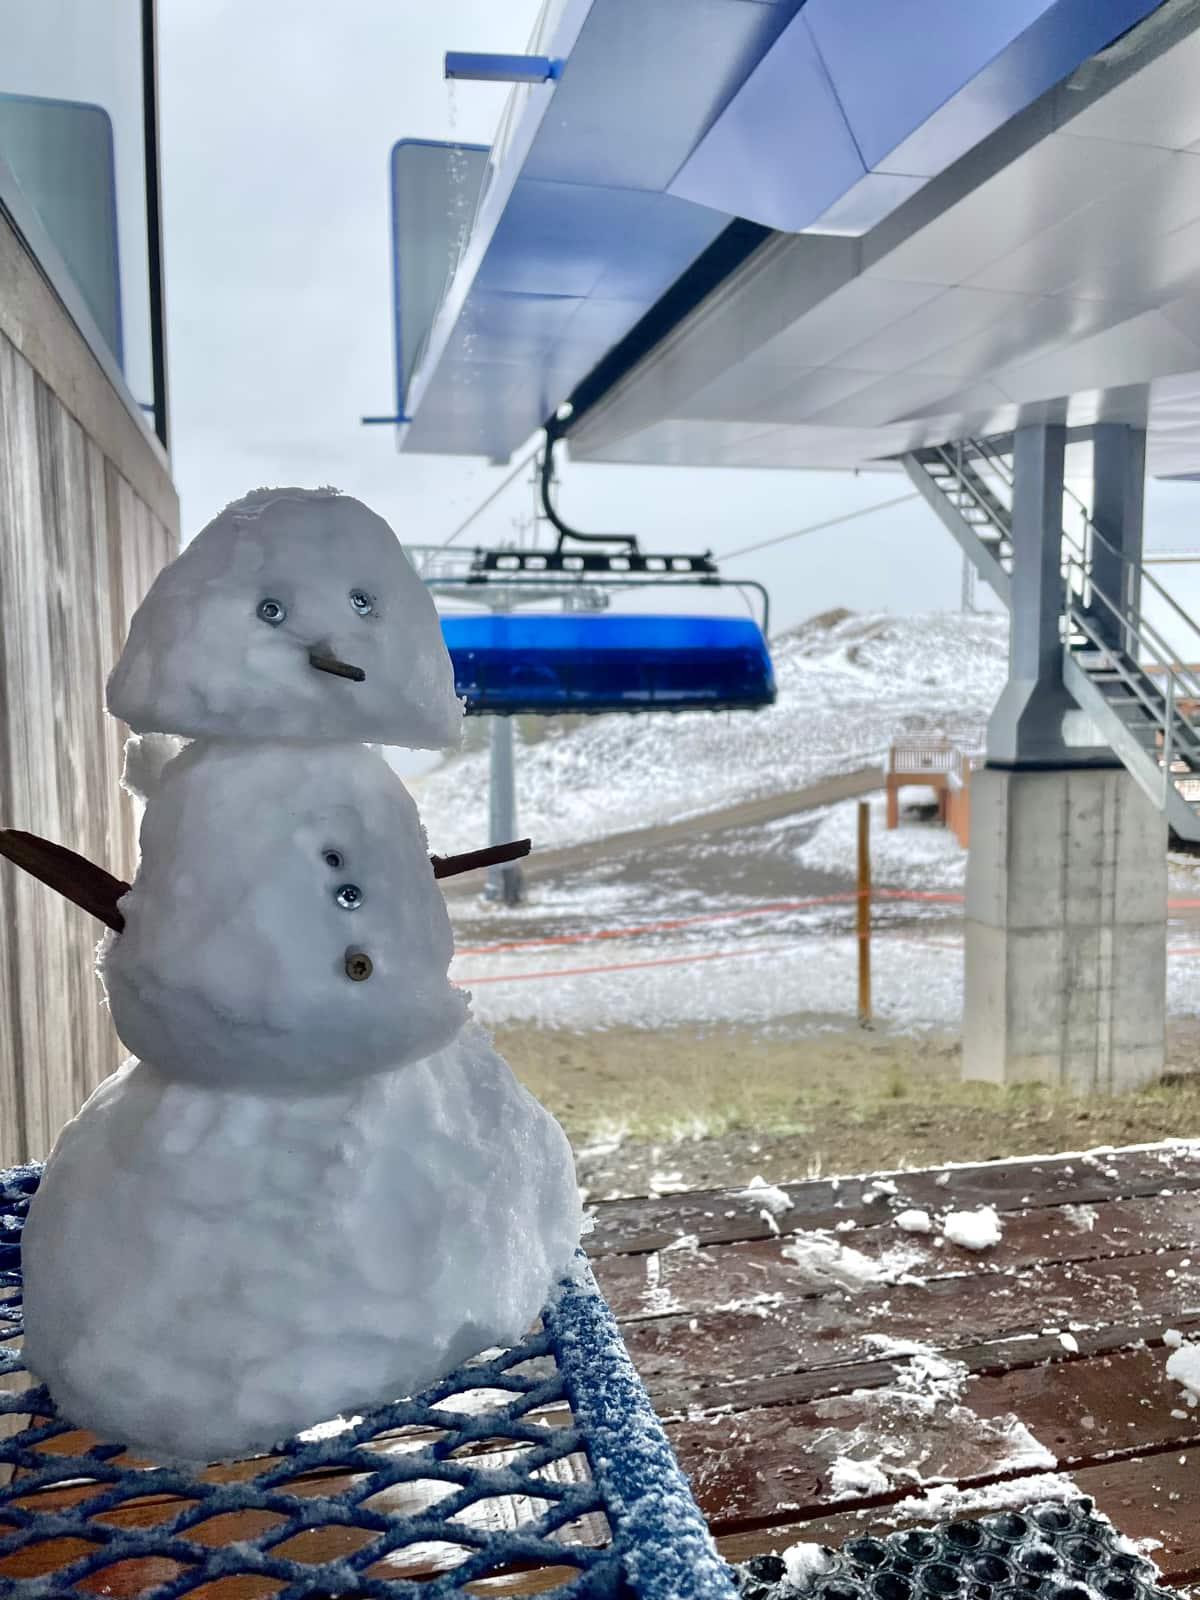 bog sky resort, Montana, snow